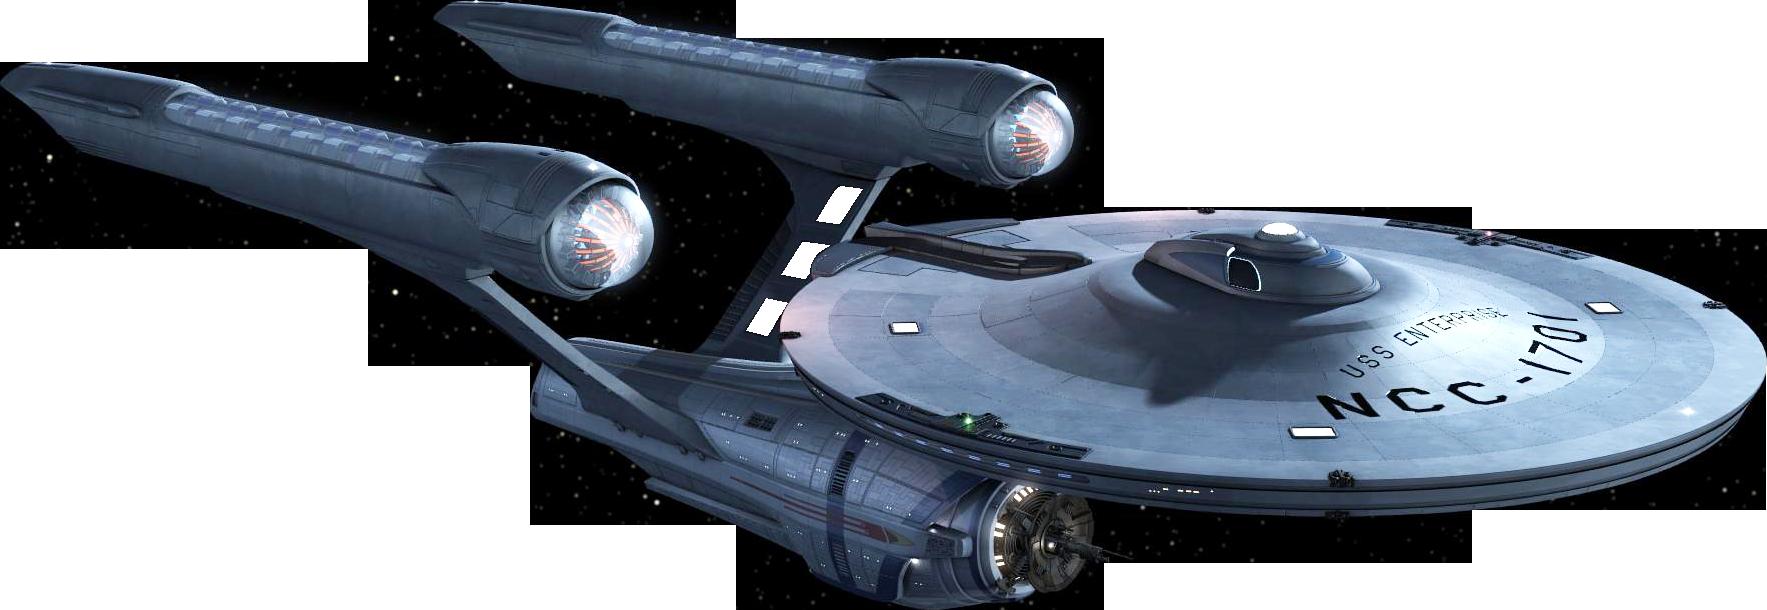 Star trek enterprise clipart vector royalty free Uss Enterprise PNG Transparent Uss Enterprise.PNG Images. | PlusPNG vector royalty free